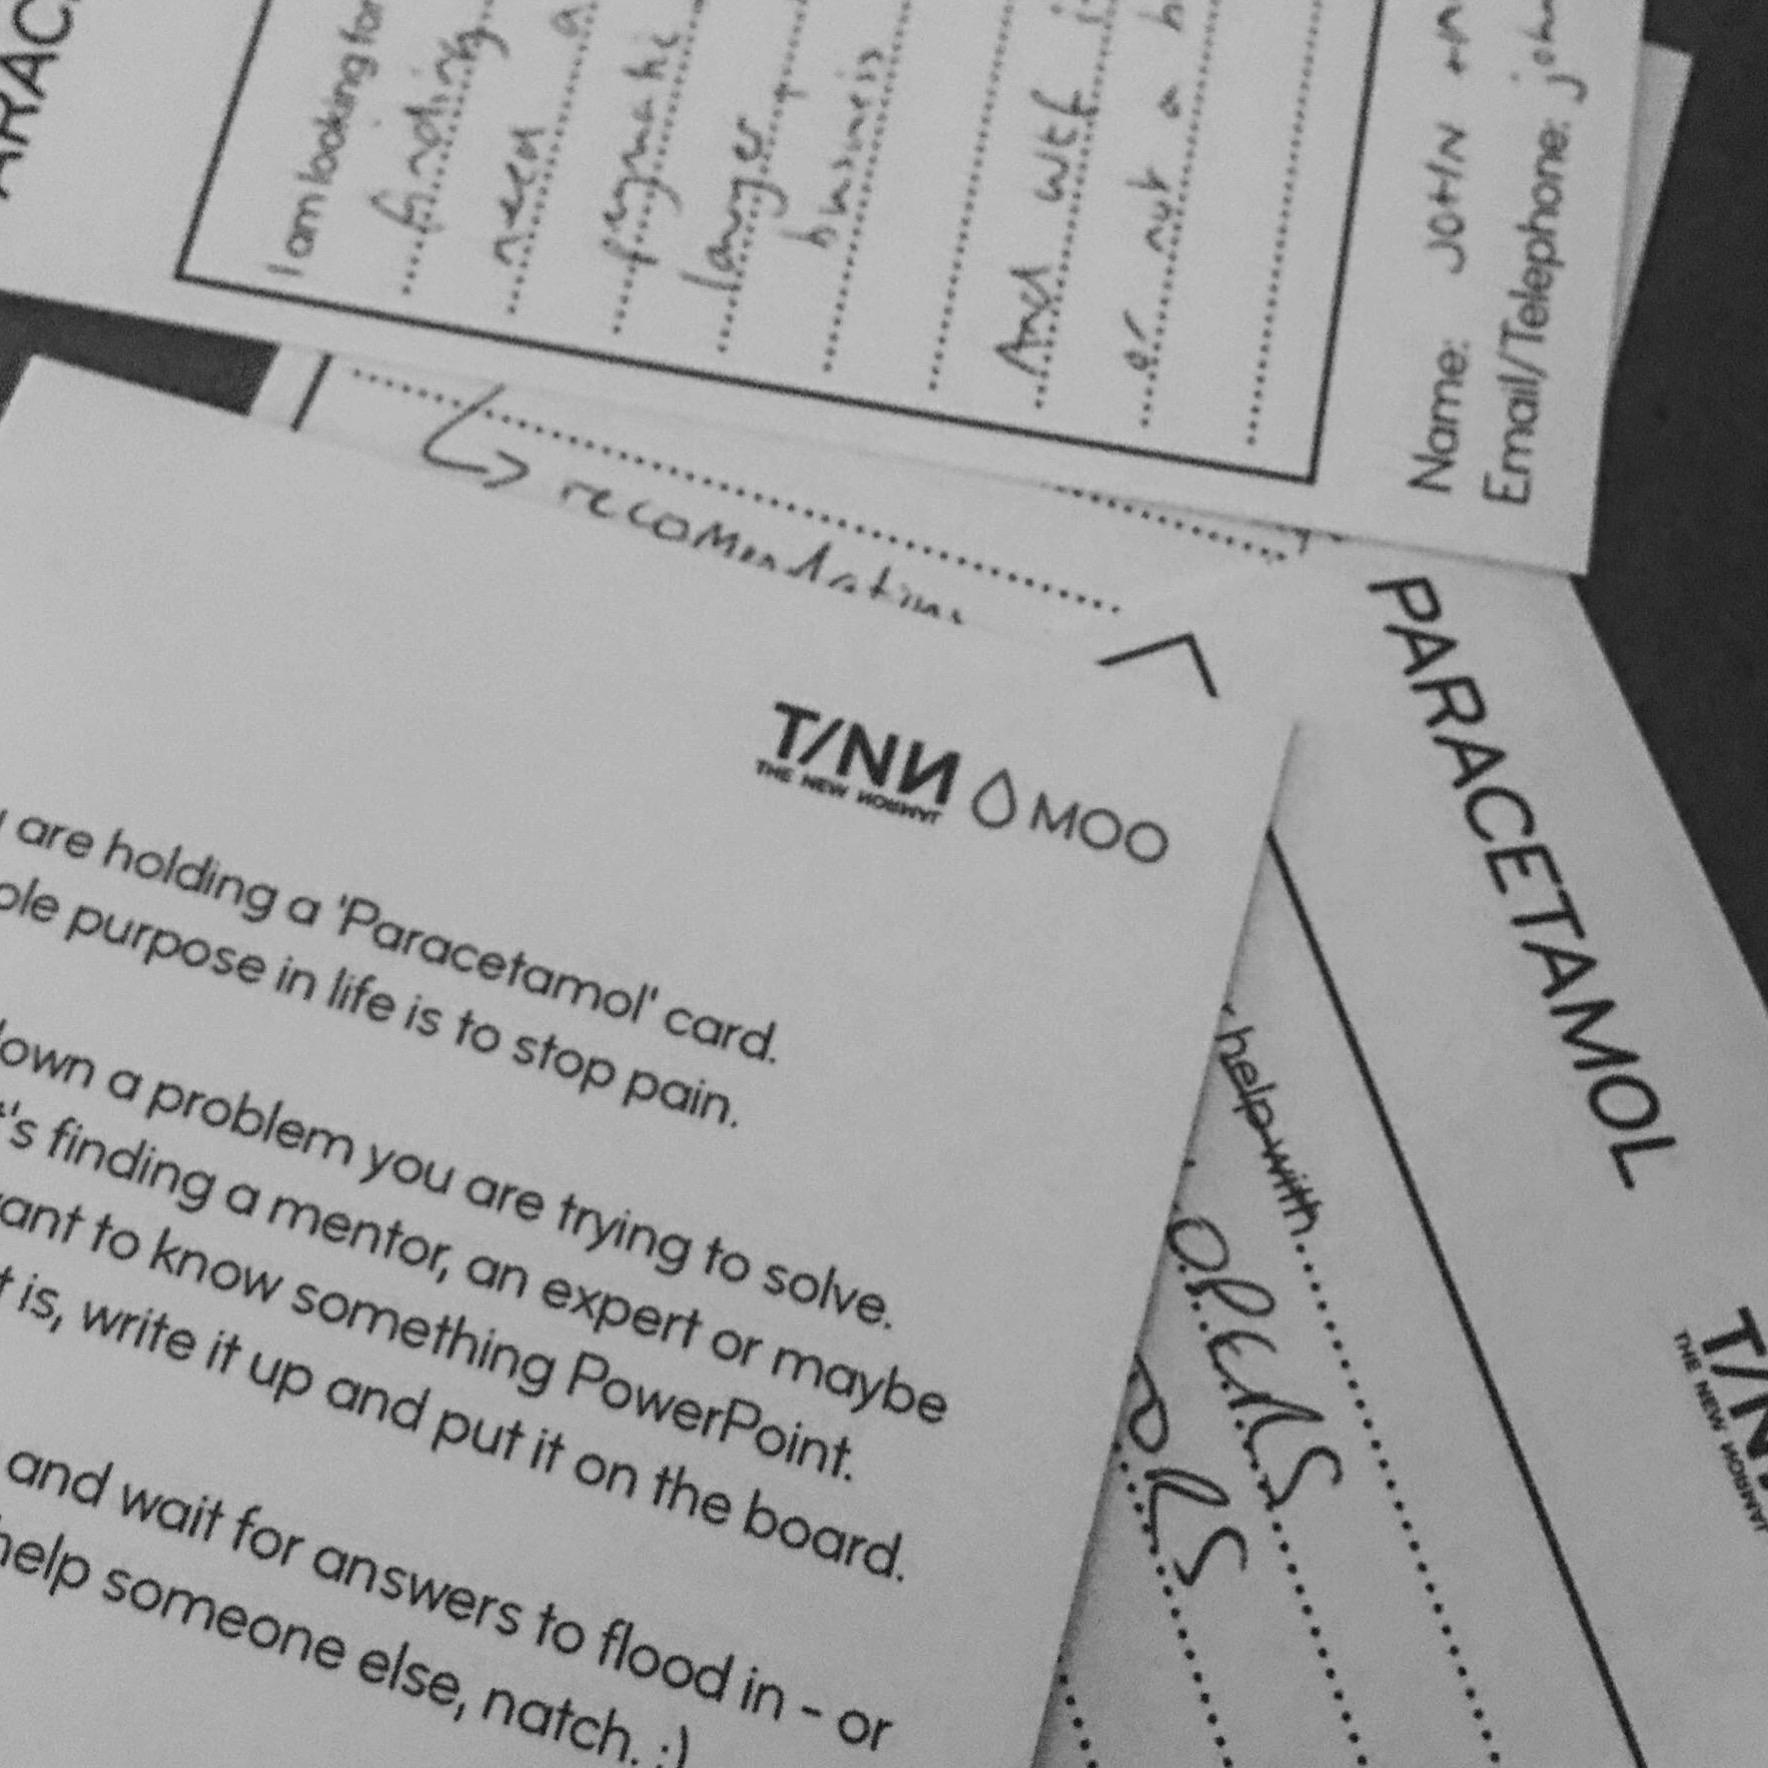 Paracetamol Card at TNN